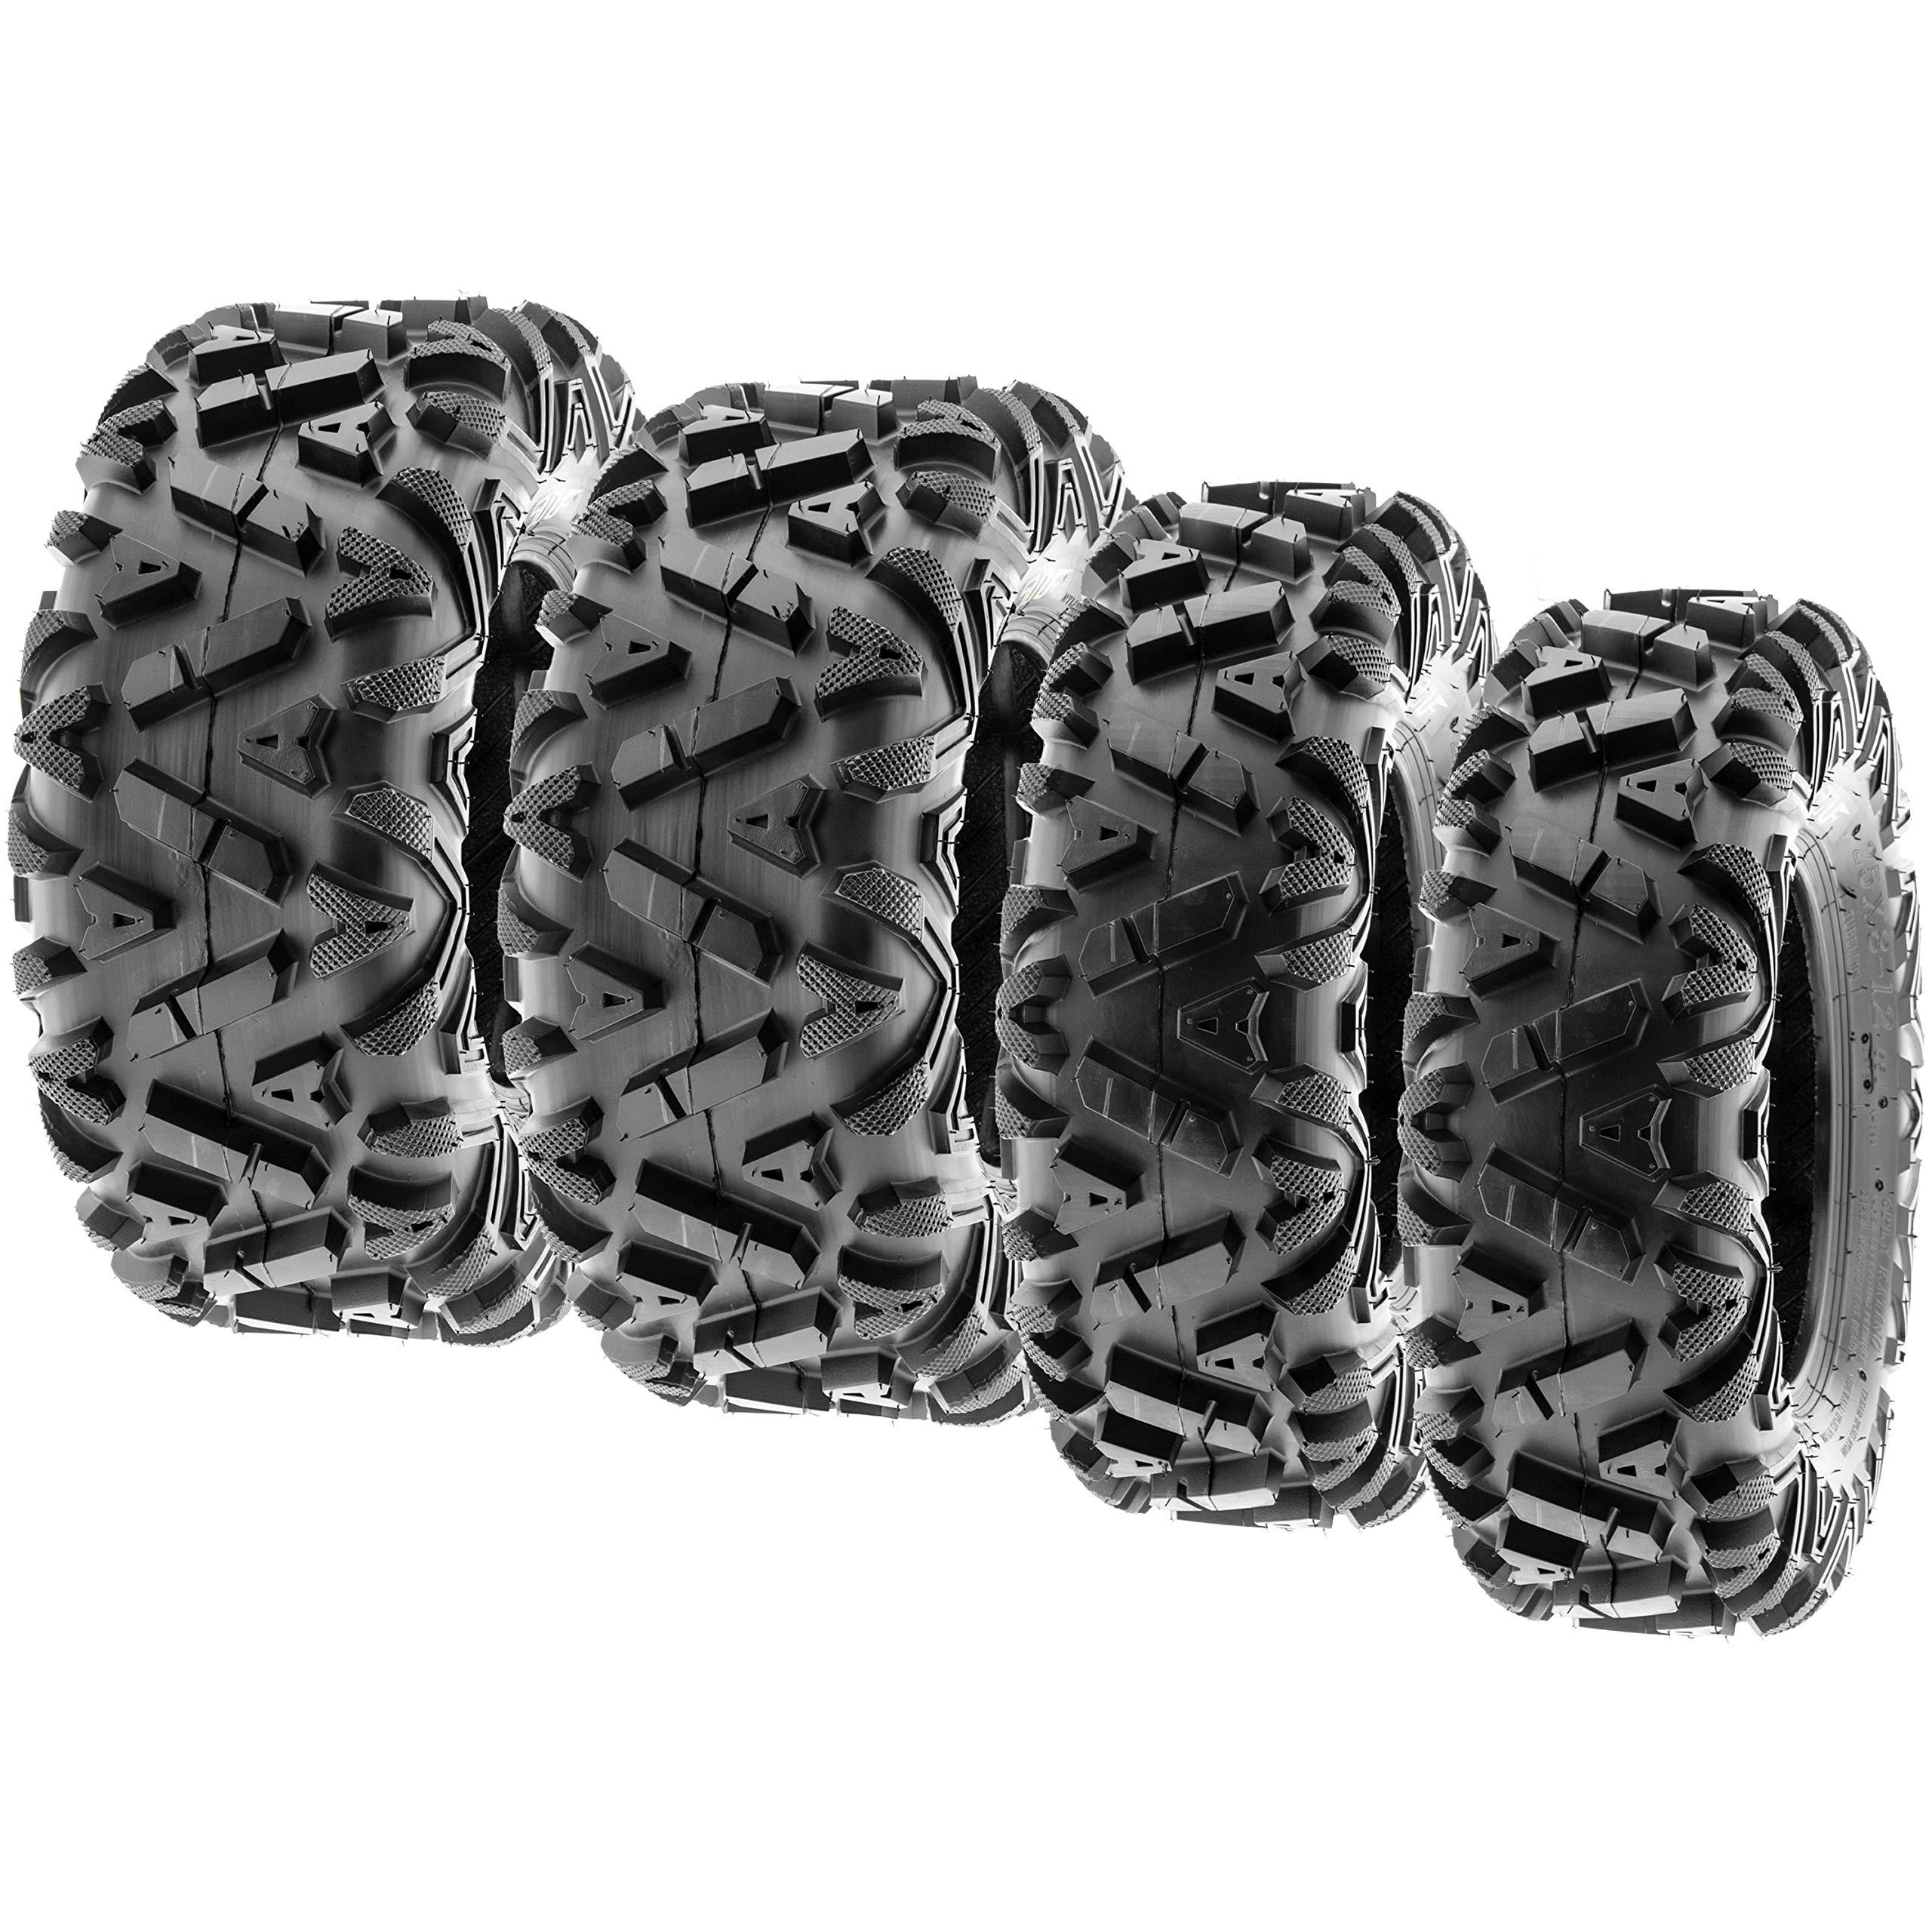 best rated in atv utv tires helpful customer reviews. Black Bedroom Furniture Sets. Home Design Ideas